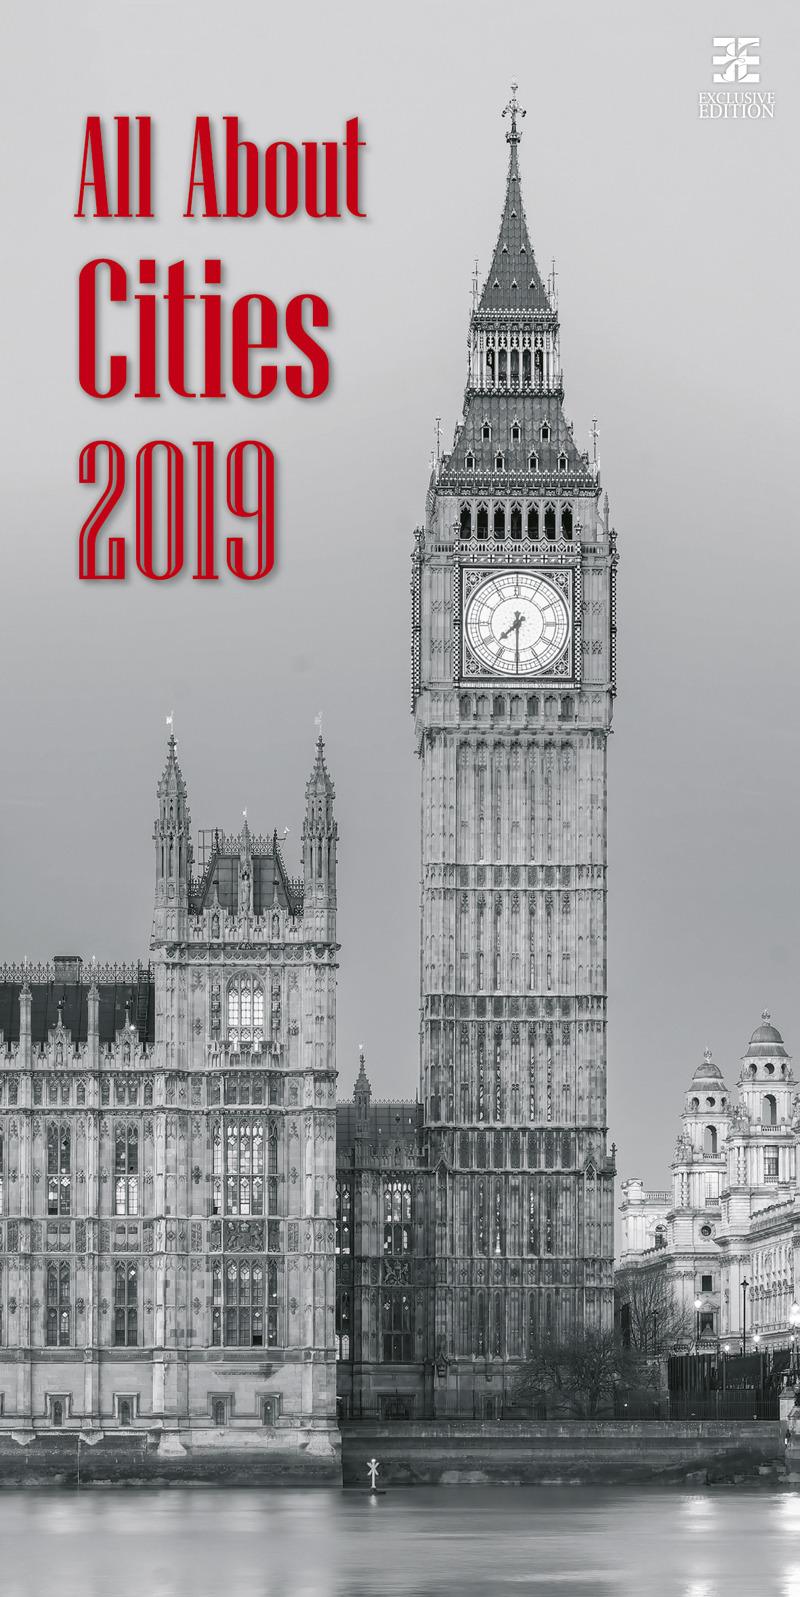 Календарь 2019. All About Cities / Всё о городах